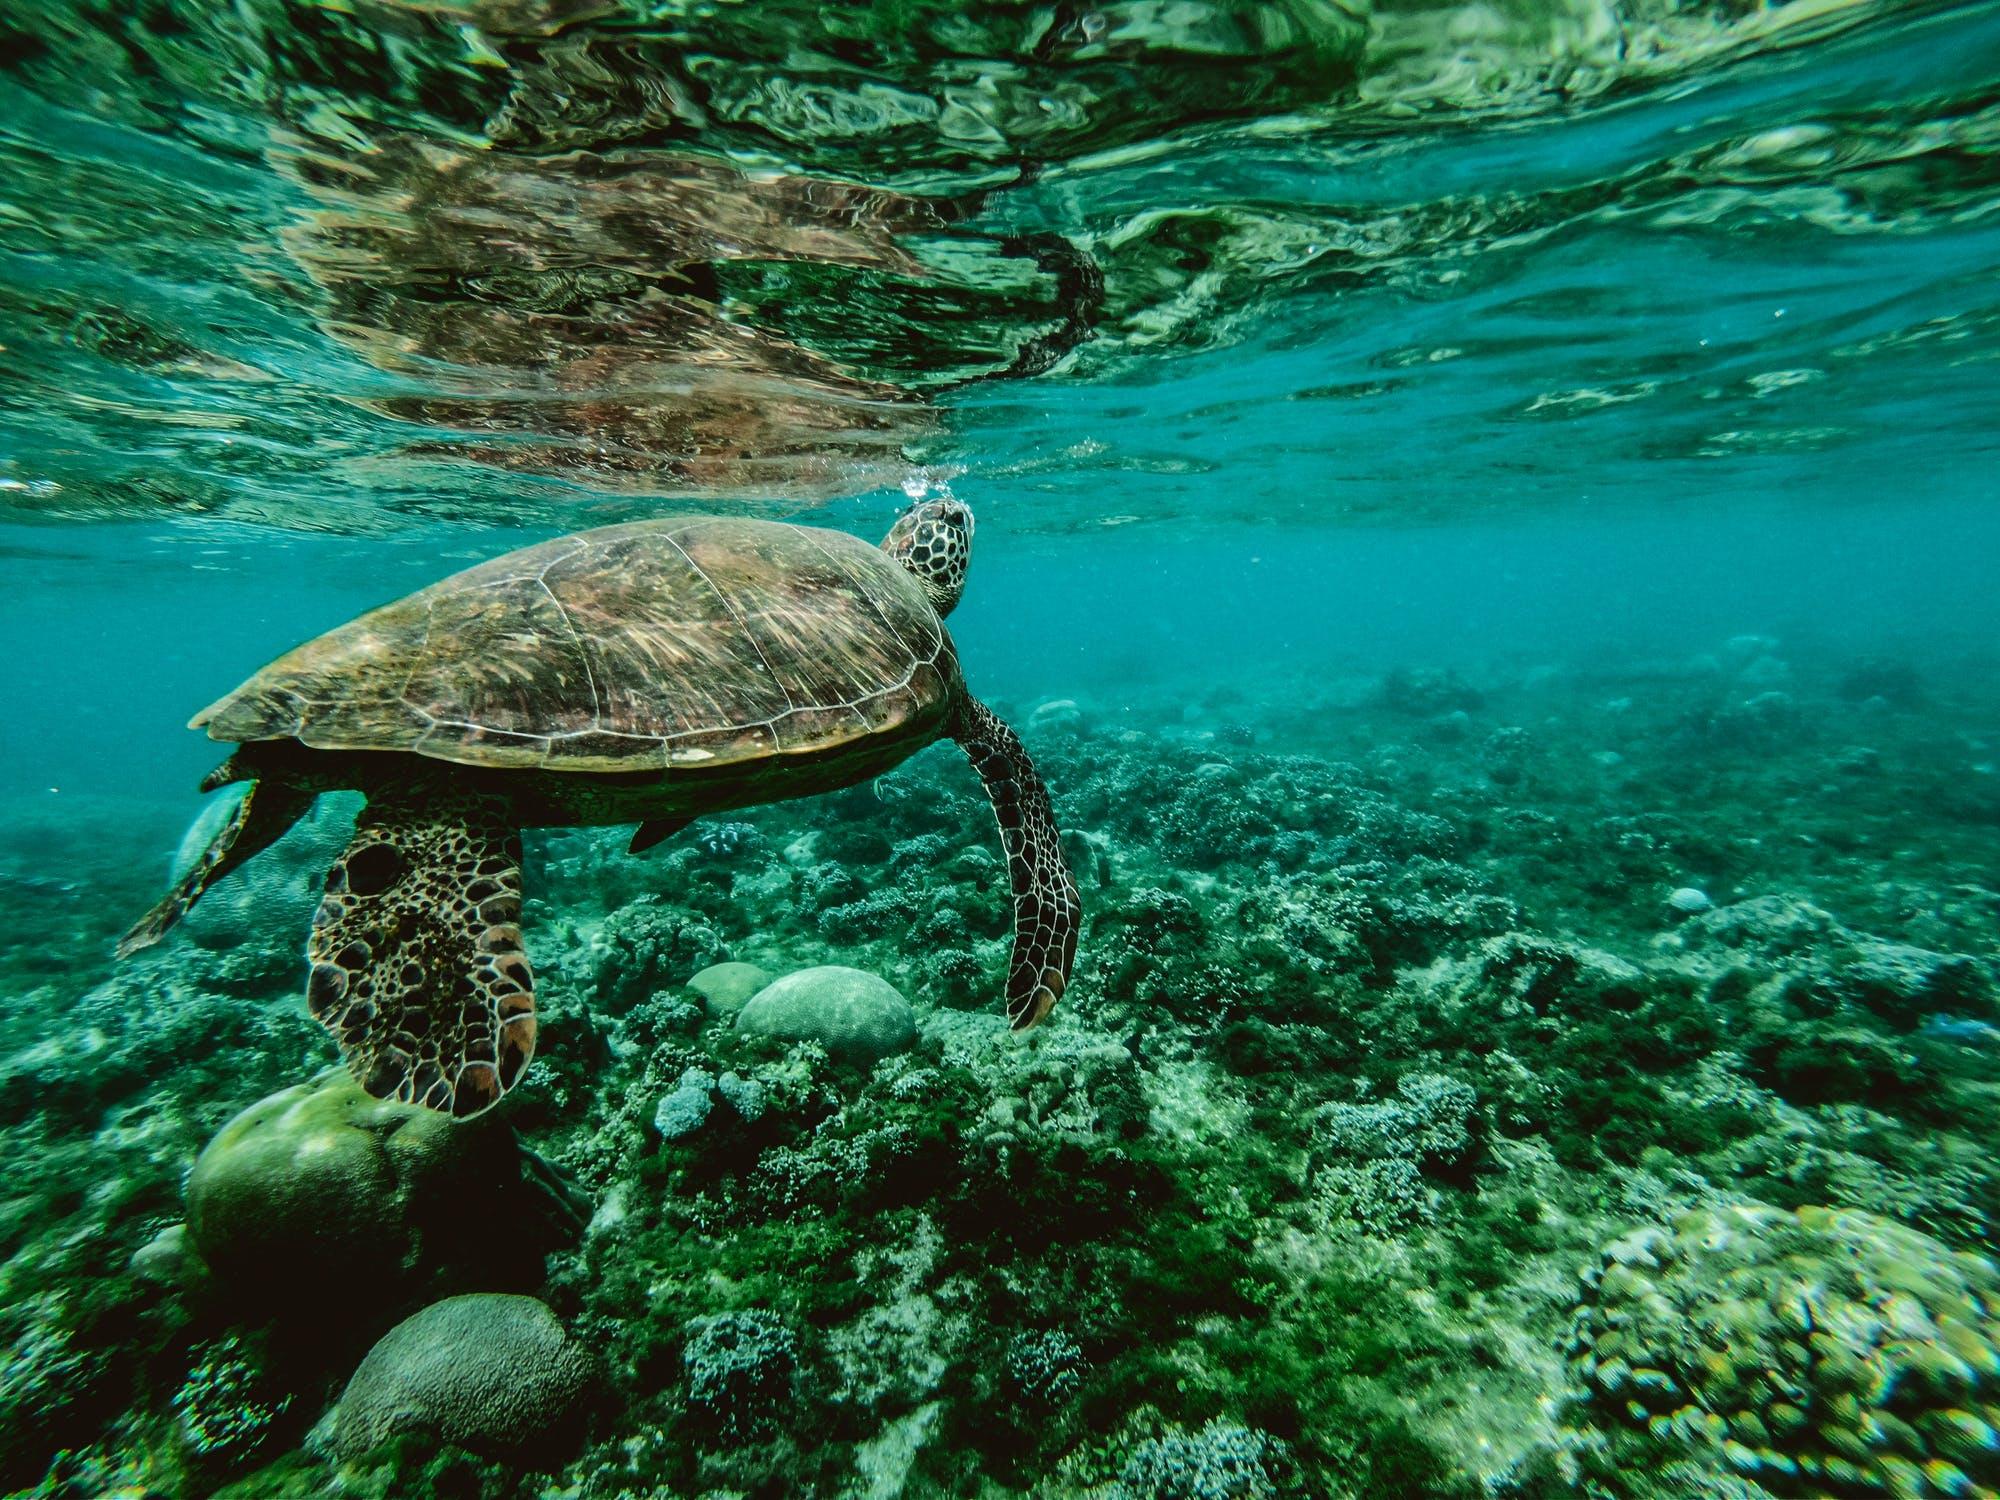 Bahamas – AquaCat Live Aboard